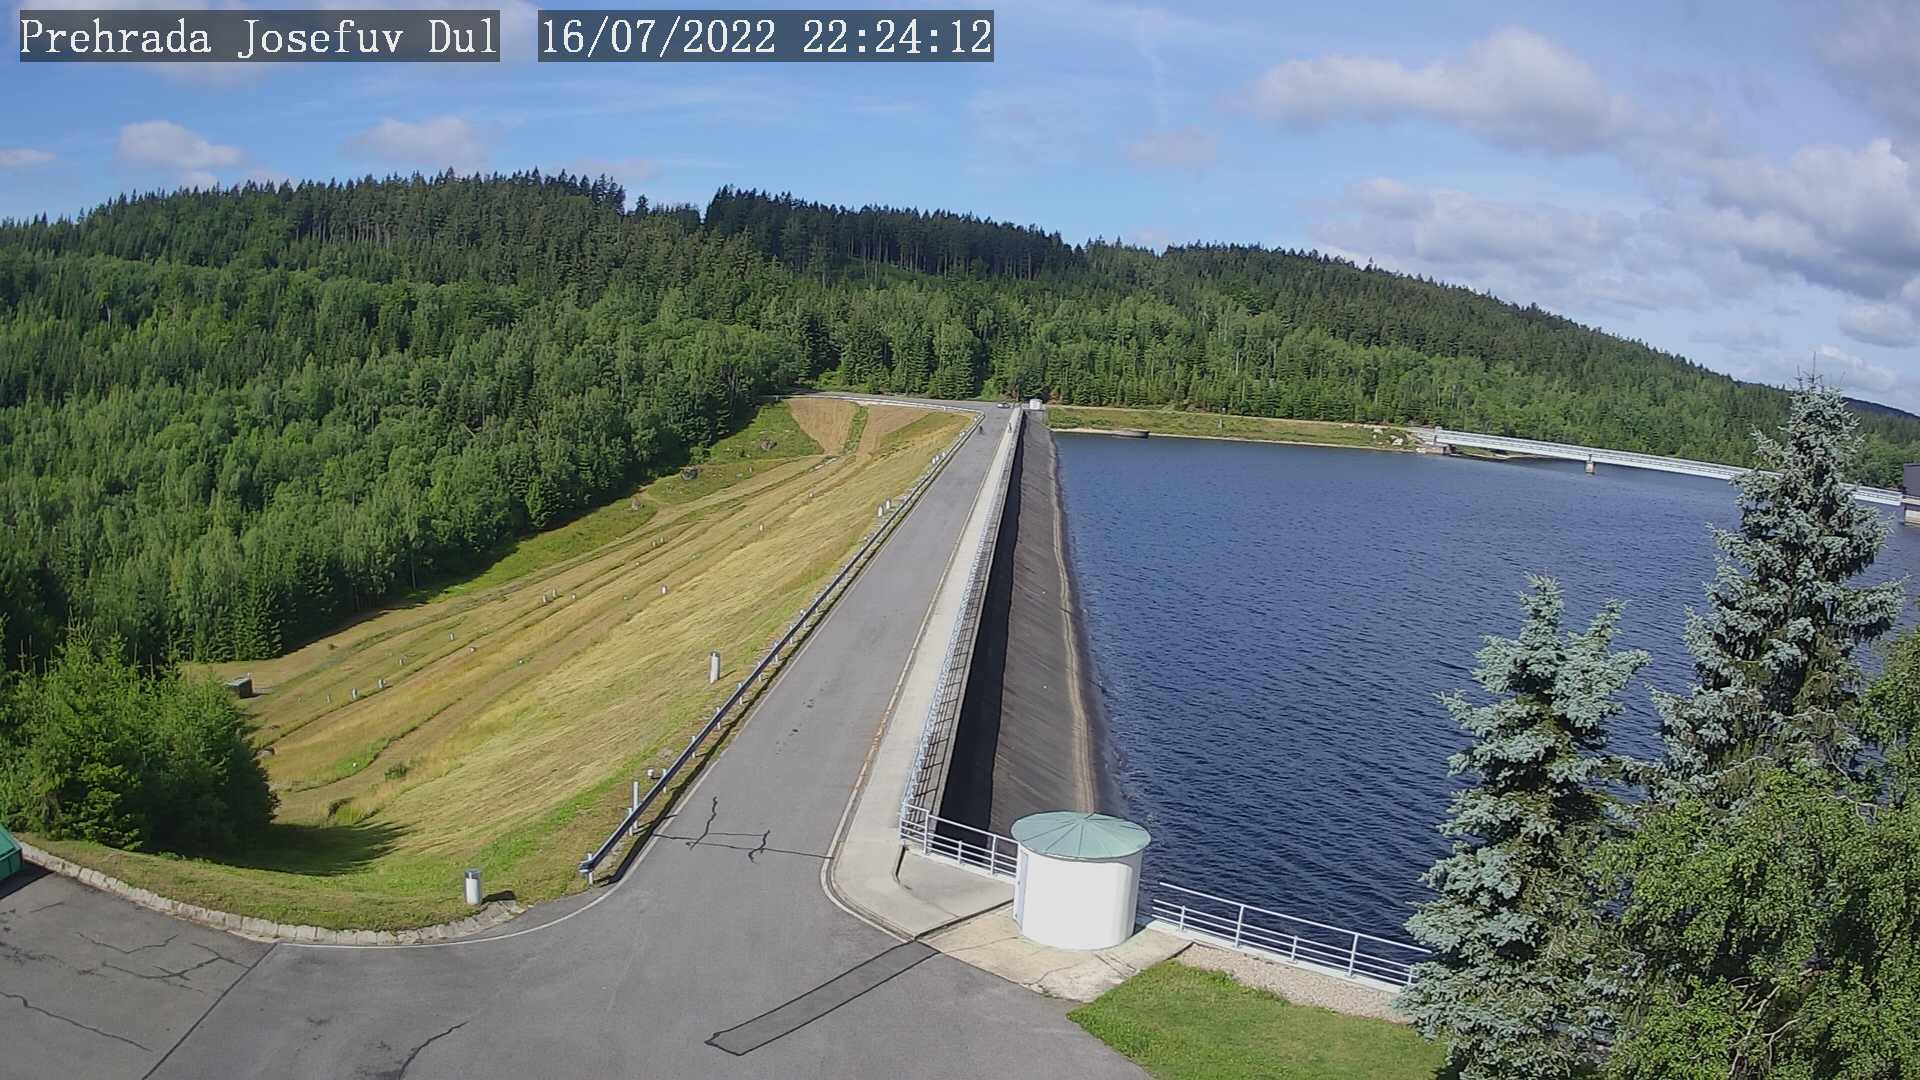 Web kamera Josefův Důl - přehrada.